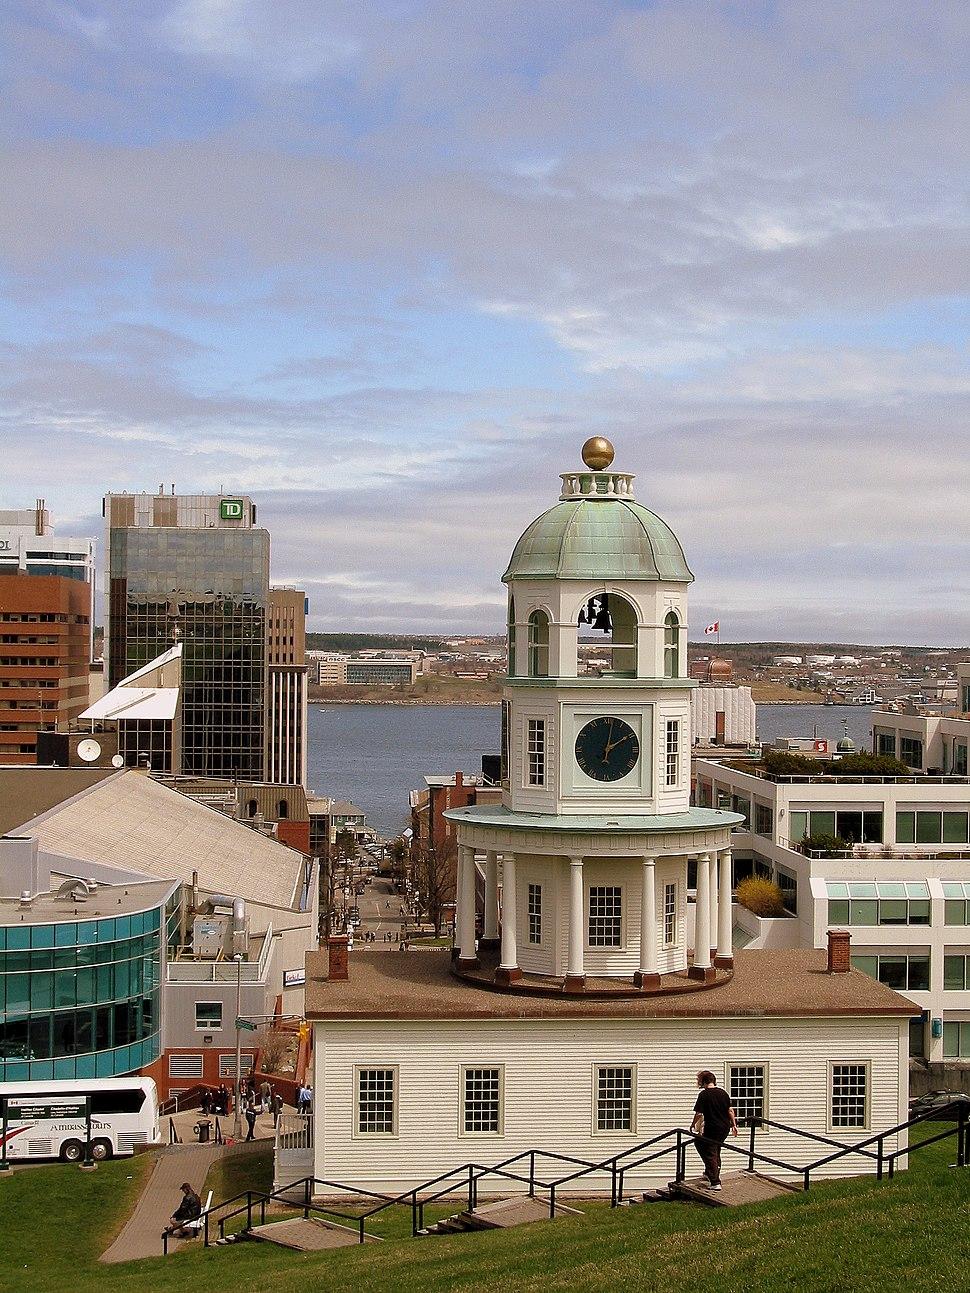 Halifax Town Clock - cdnav8r